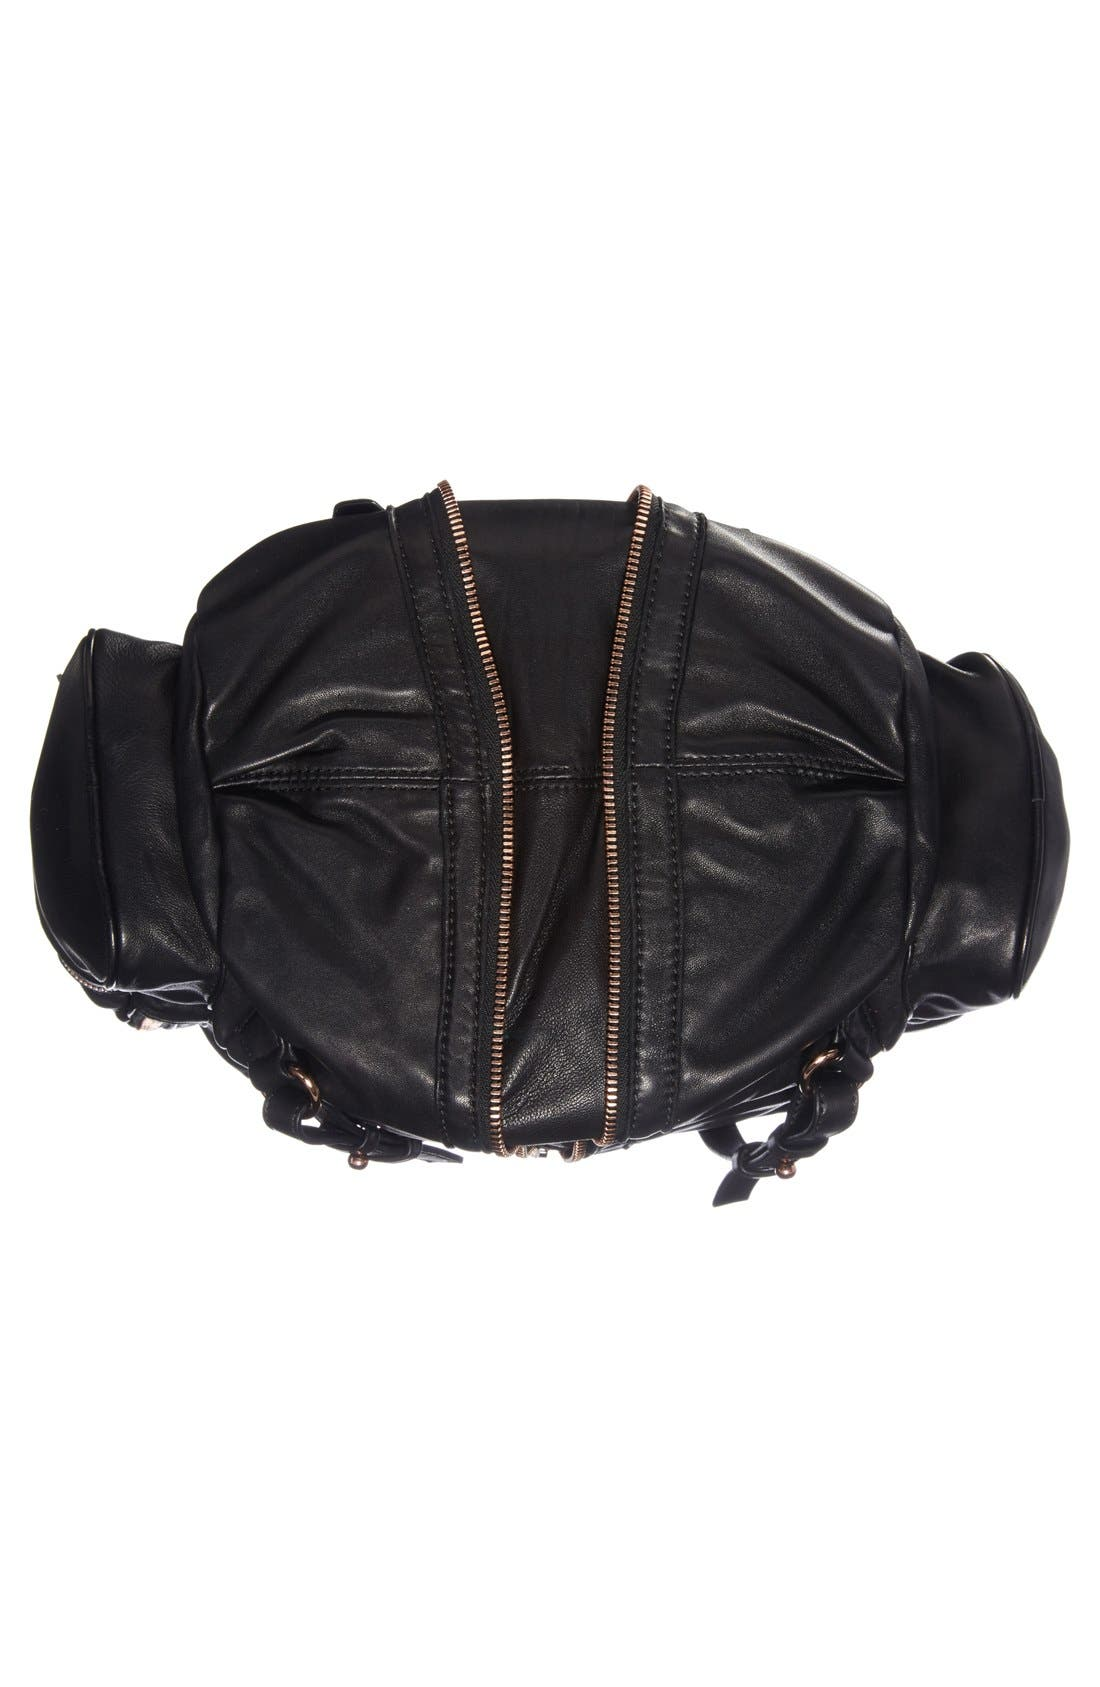 'Marti - Rose Gold' Leather Backpack,                             Alternate thumbnail 4, color,                             001